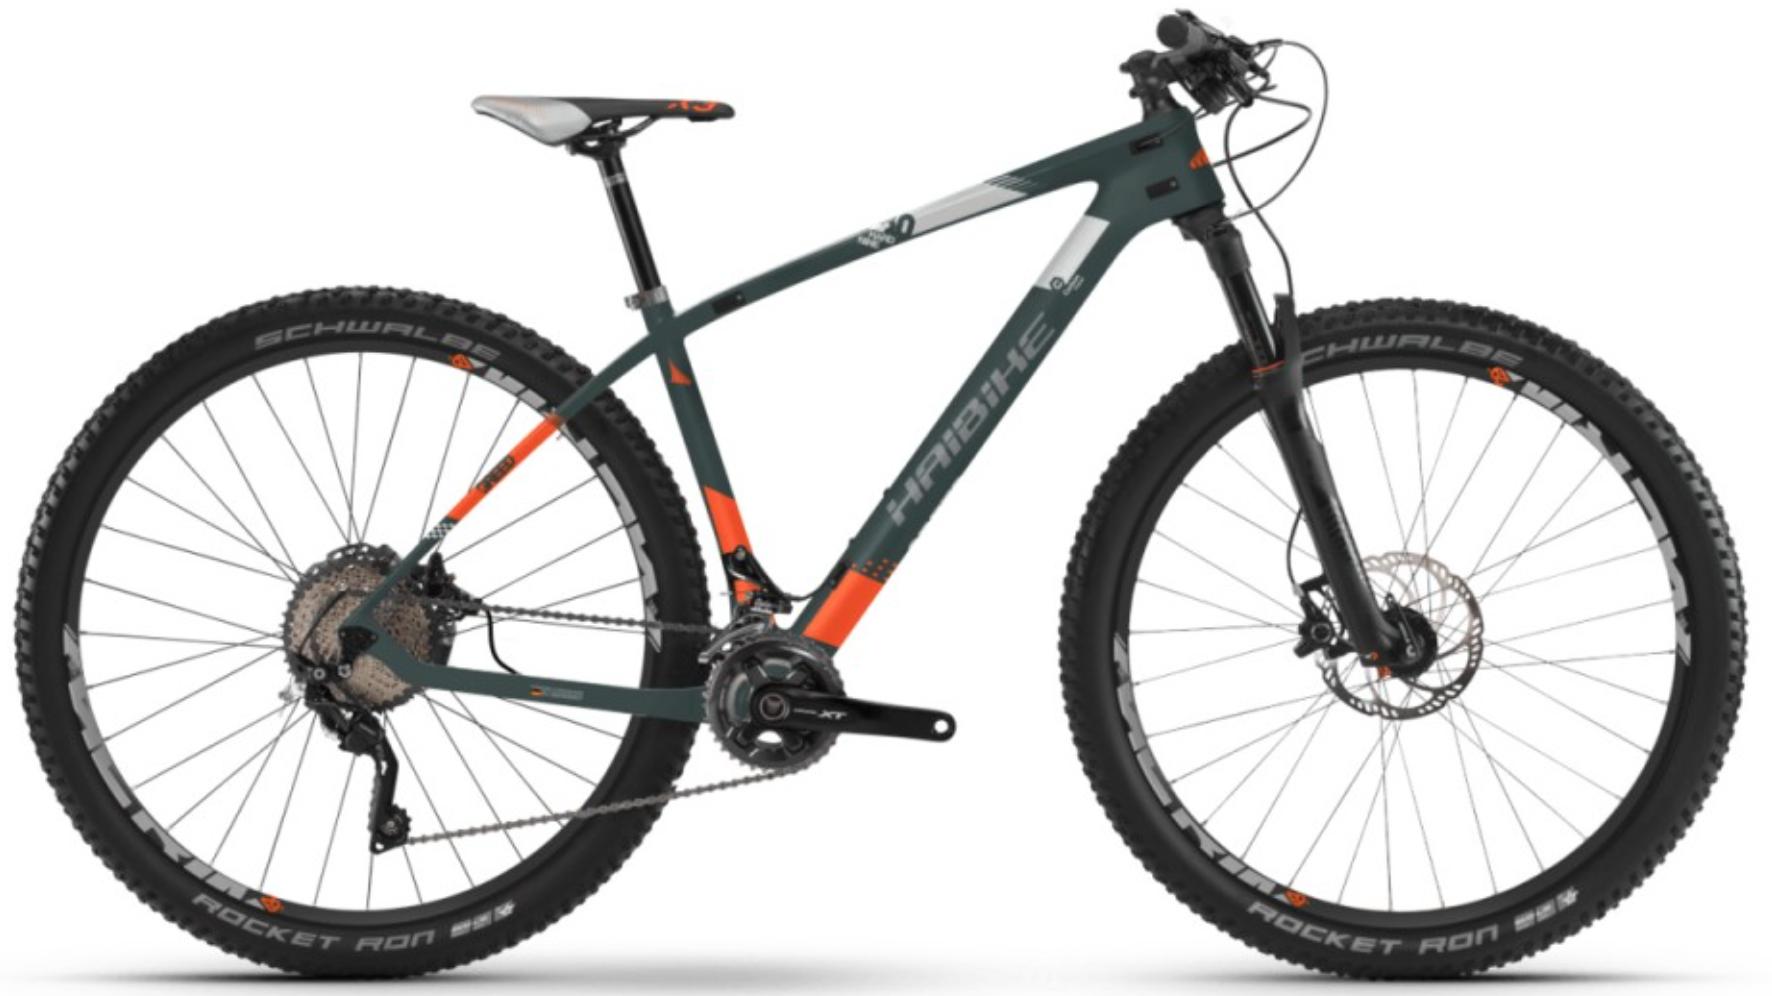 haibike greed hardnine 8 0 29r mountain bike 2018 online neu. Black Bedroom Furniture Sets. Home Design Ideas